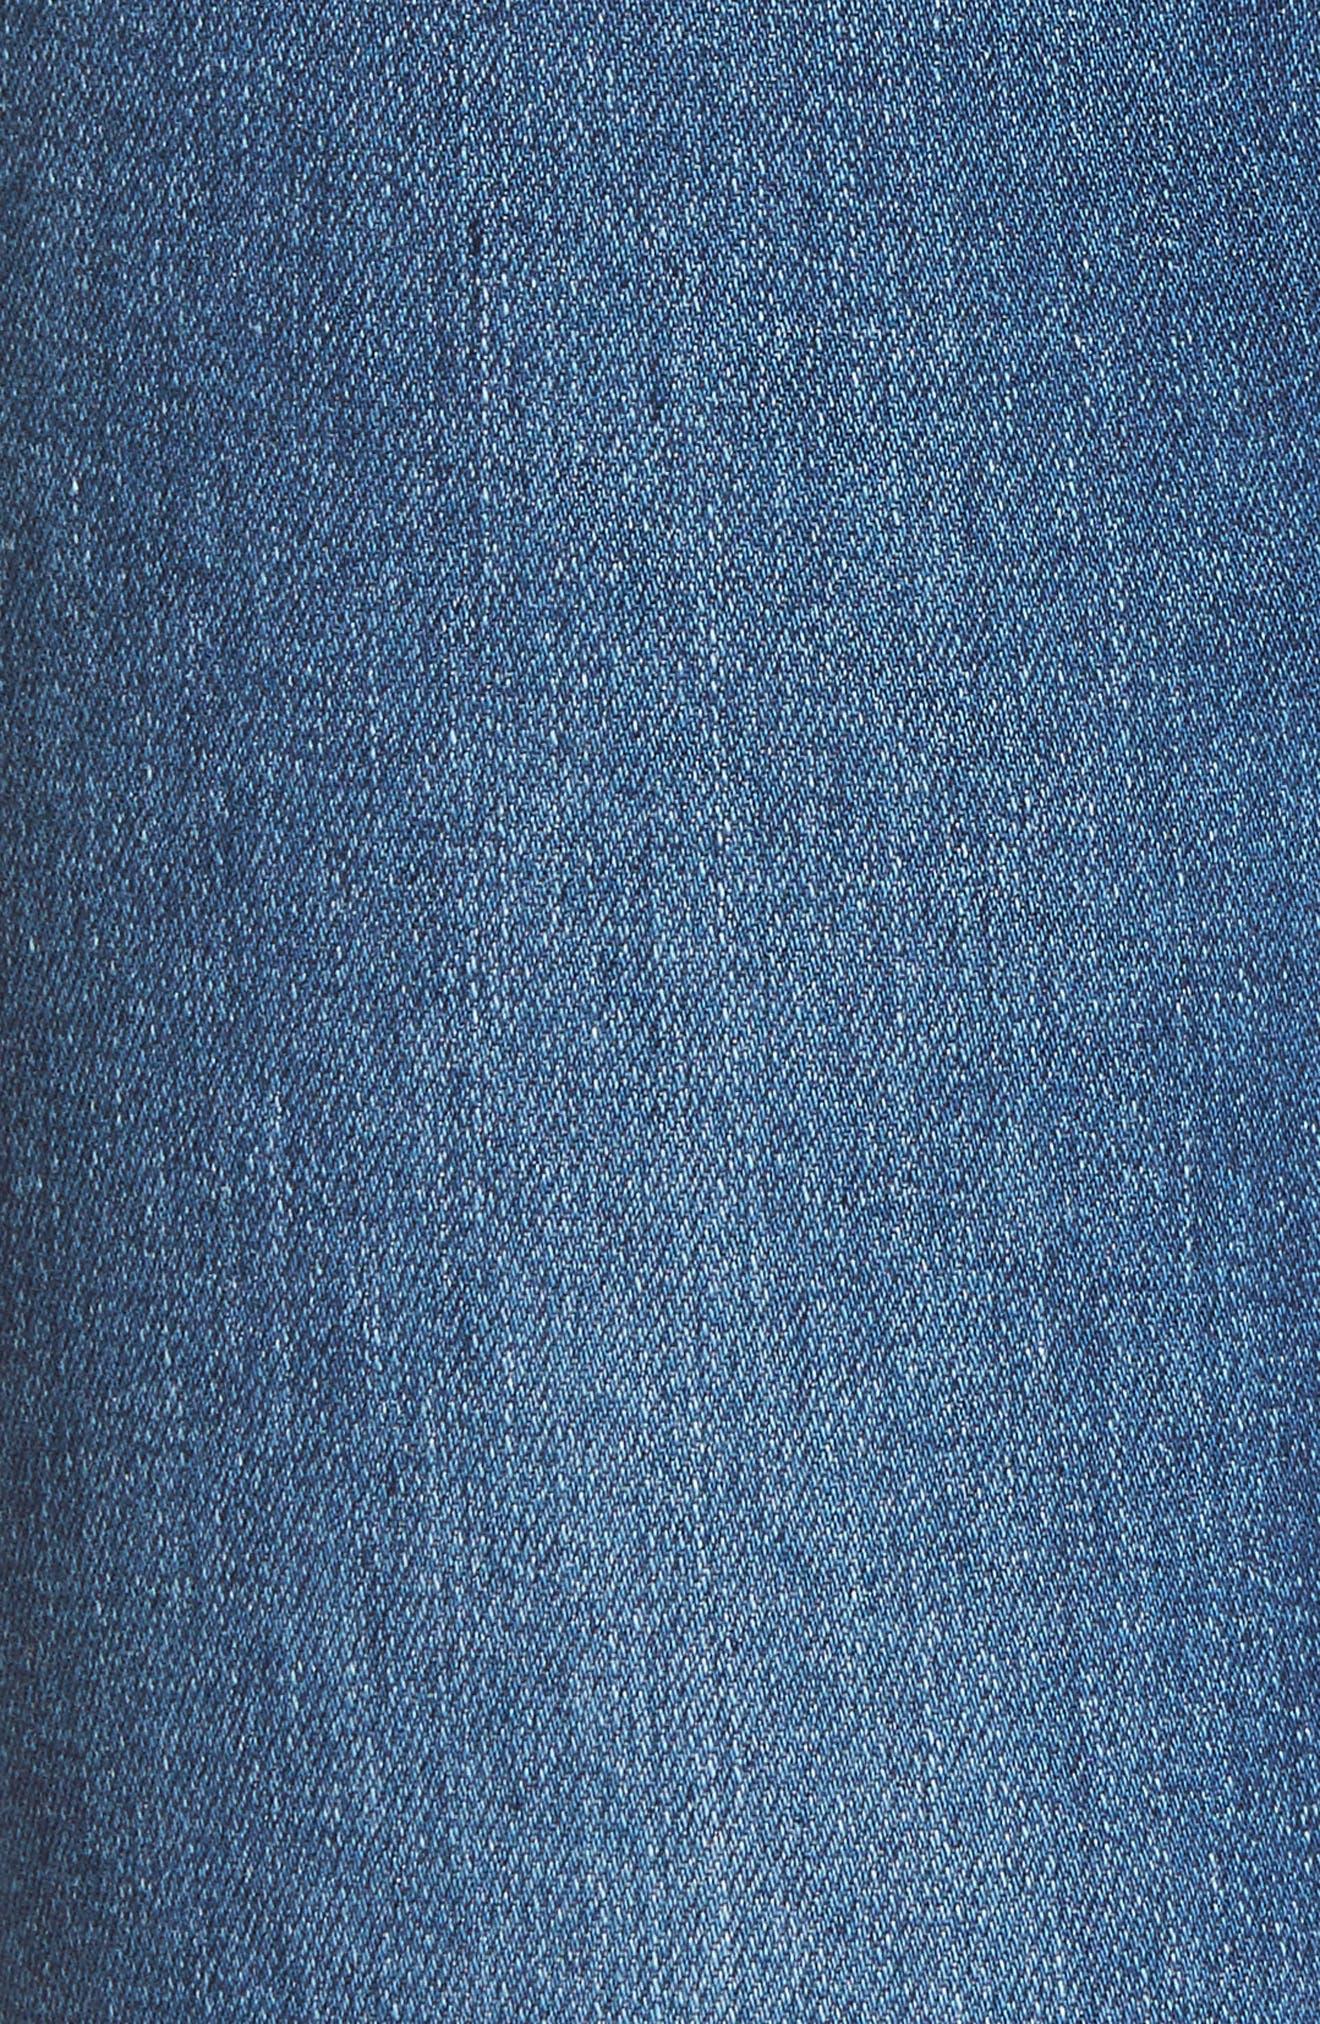 Mila High Waist Skinny Jeans,                             Alternate thumbnail 5, color,                             473